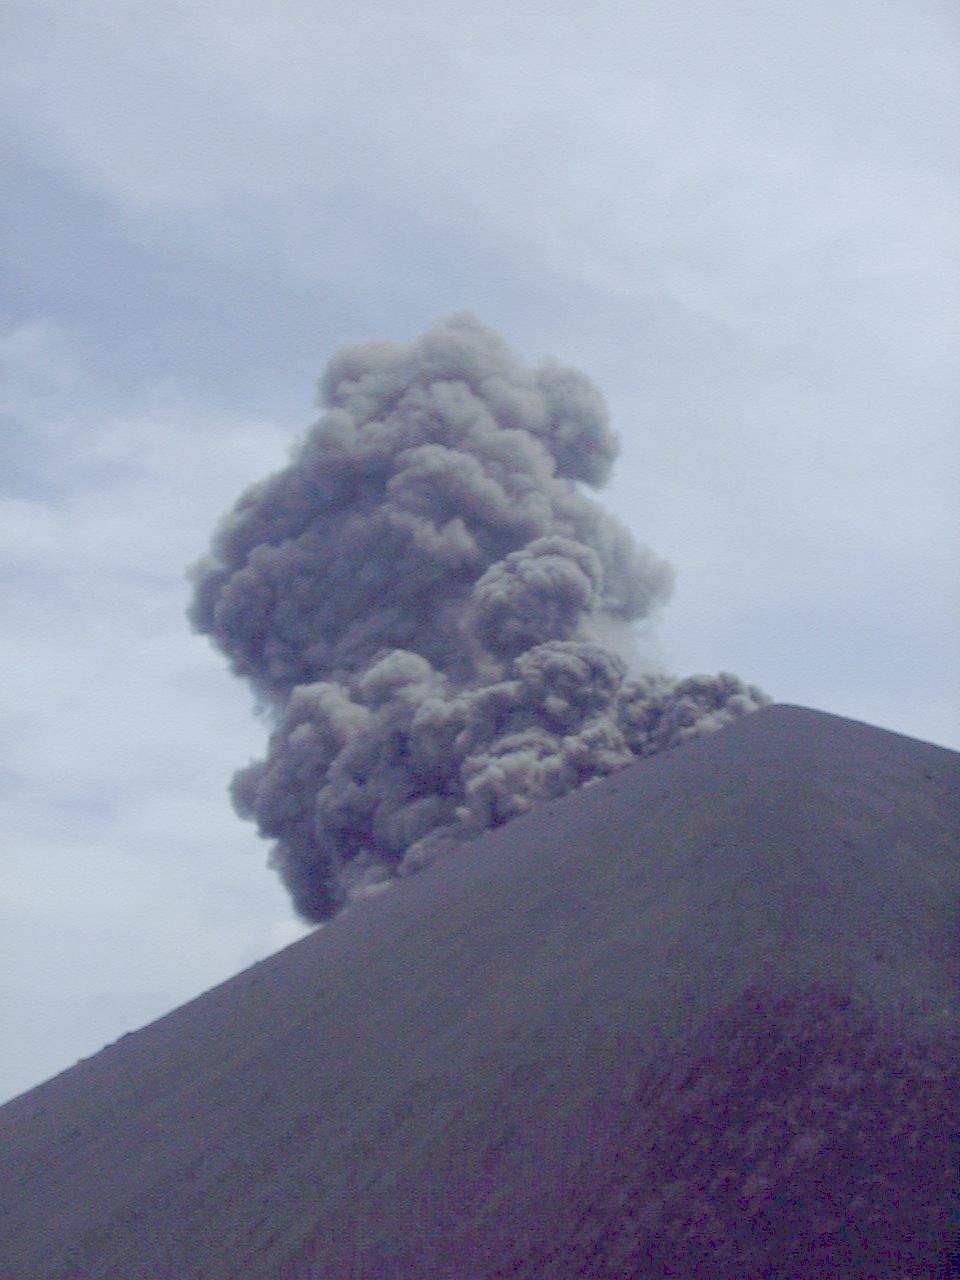 pin volcanic eruption krakatoa 1883 image search results